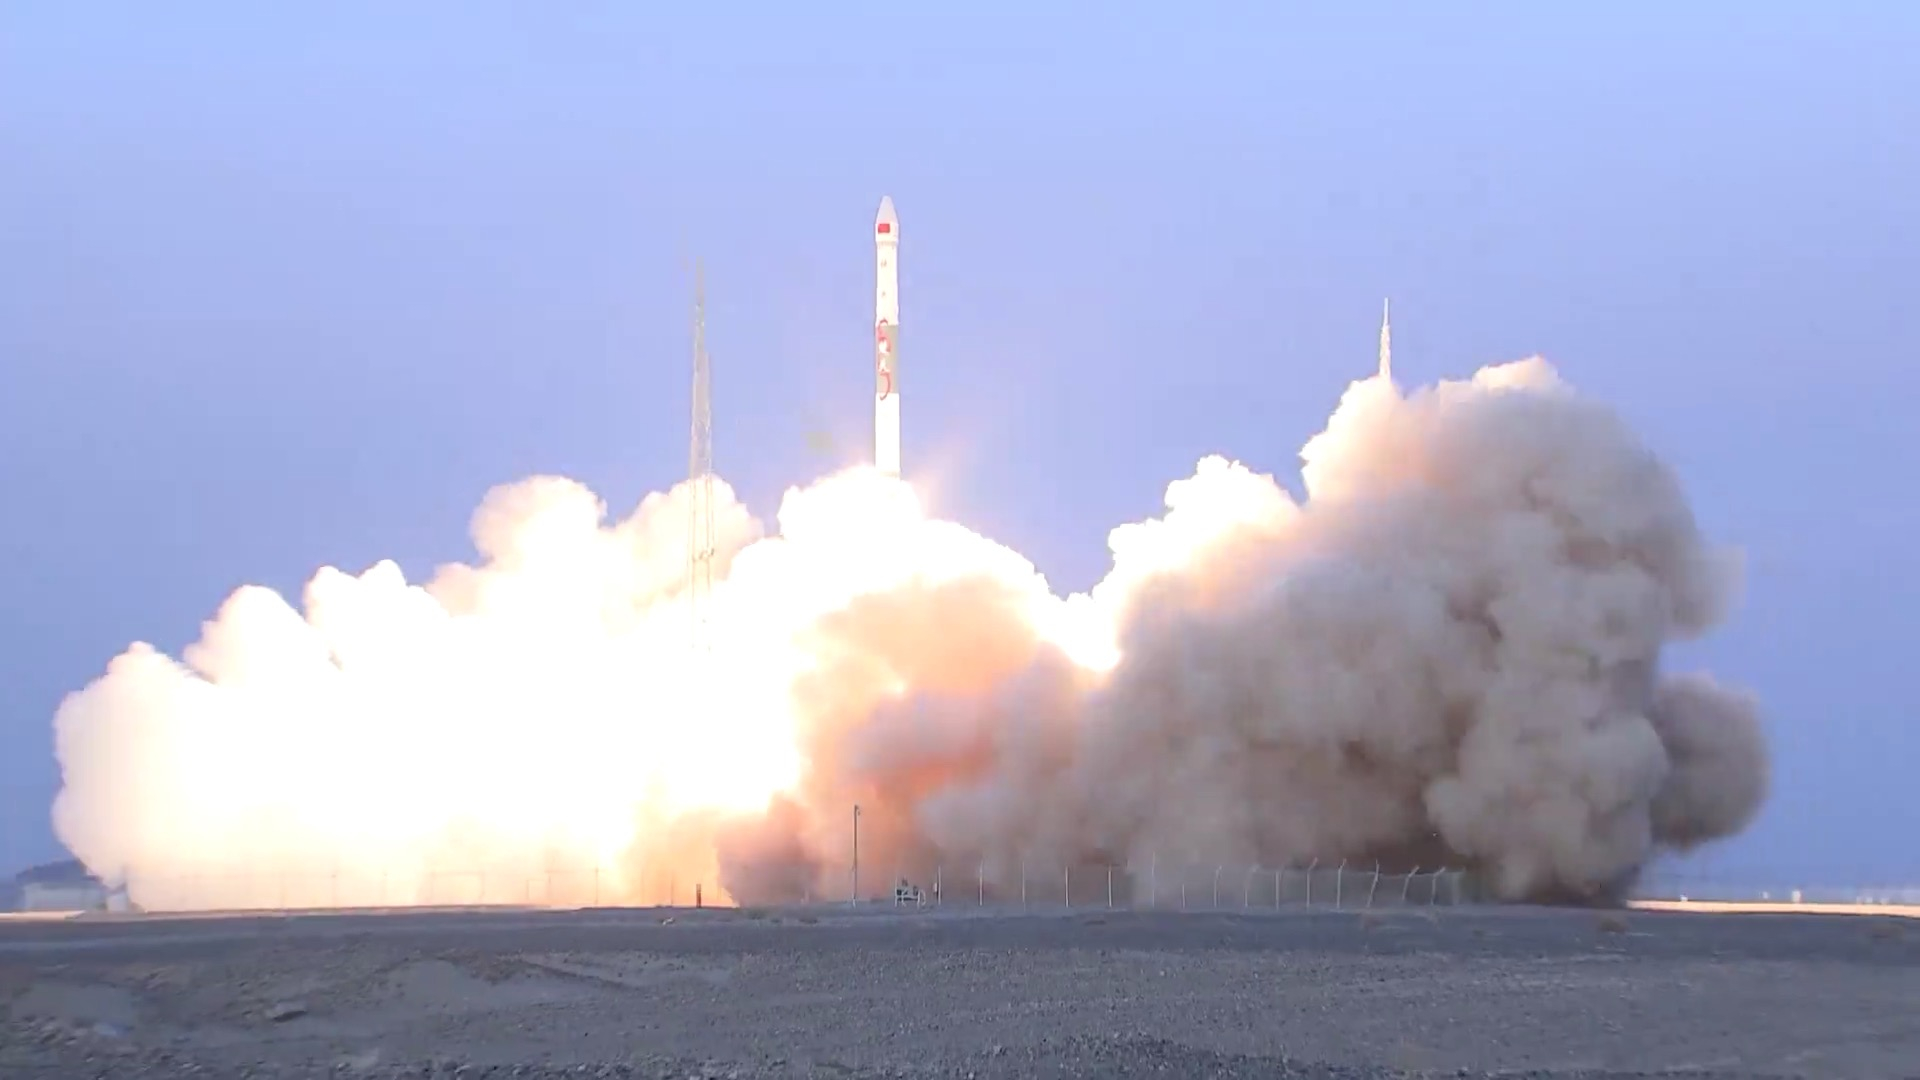 Kuaizhou-1A launches KL-α-A and KL-α-B satellites